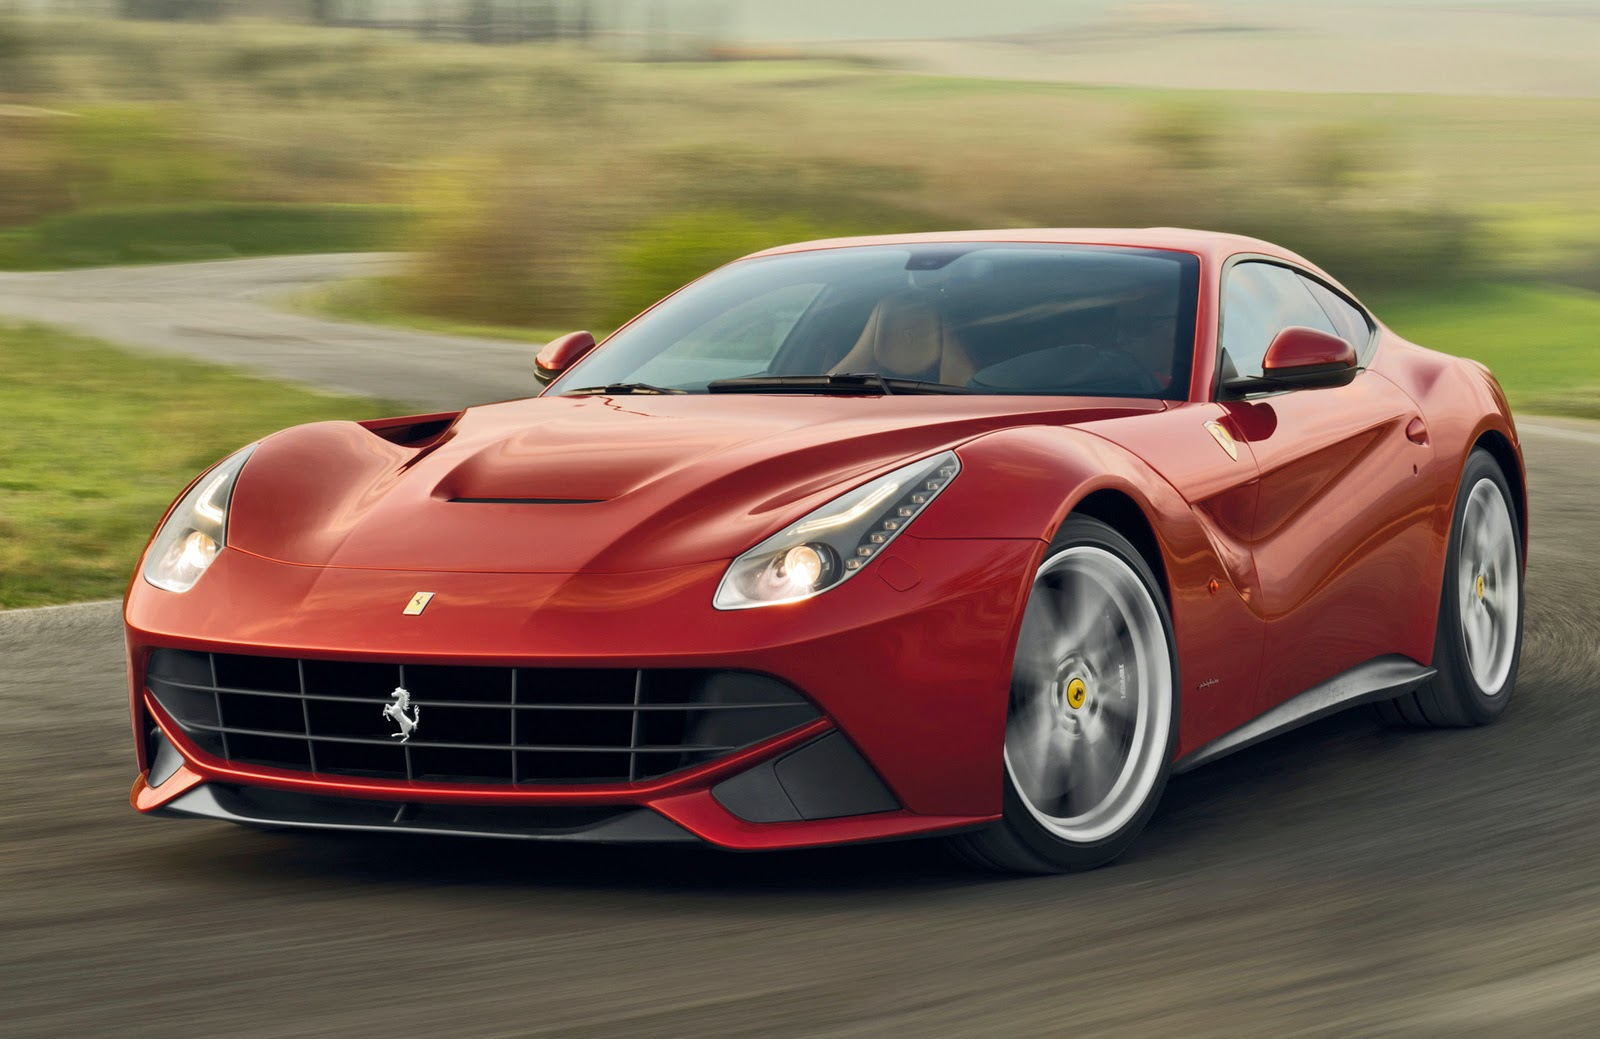 2014 Ferrari F12 Berlinetta Wallpapers | Car Wallpaper ...